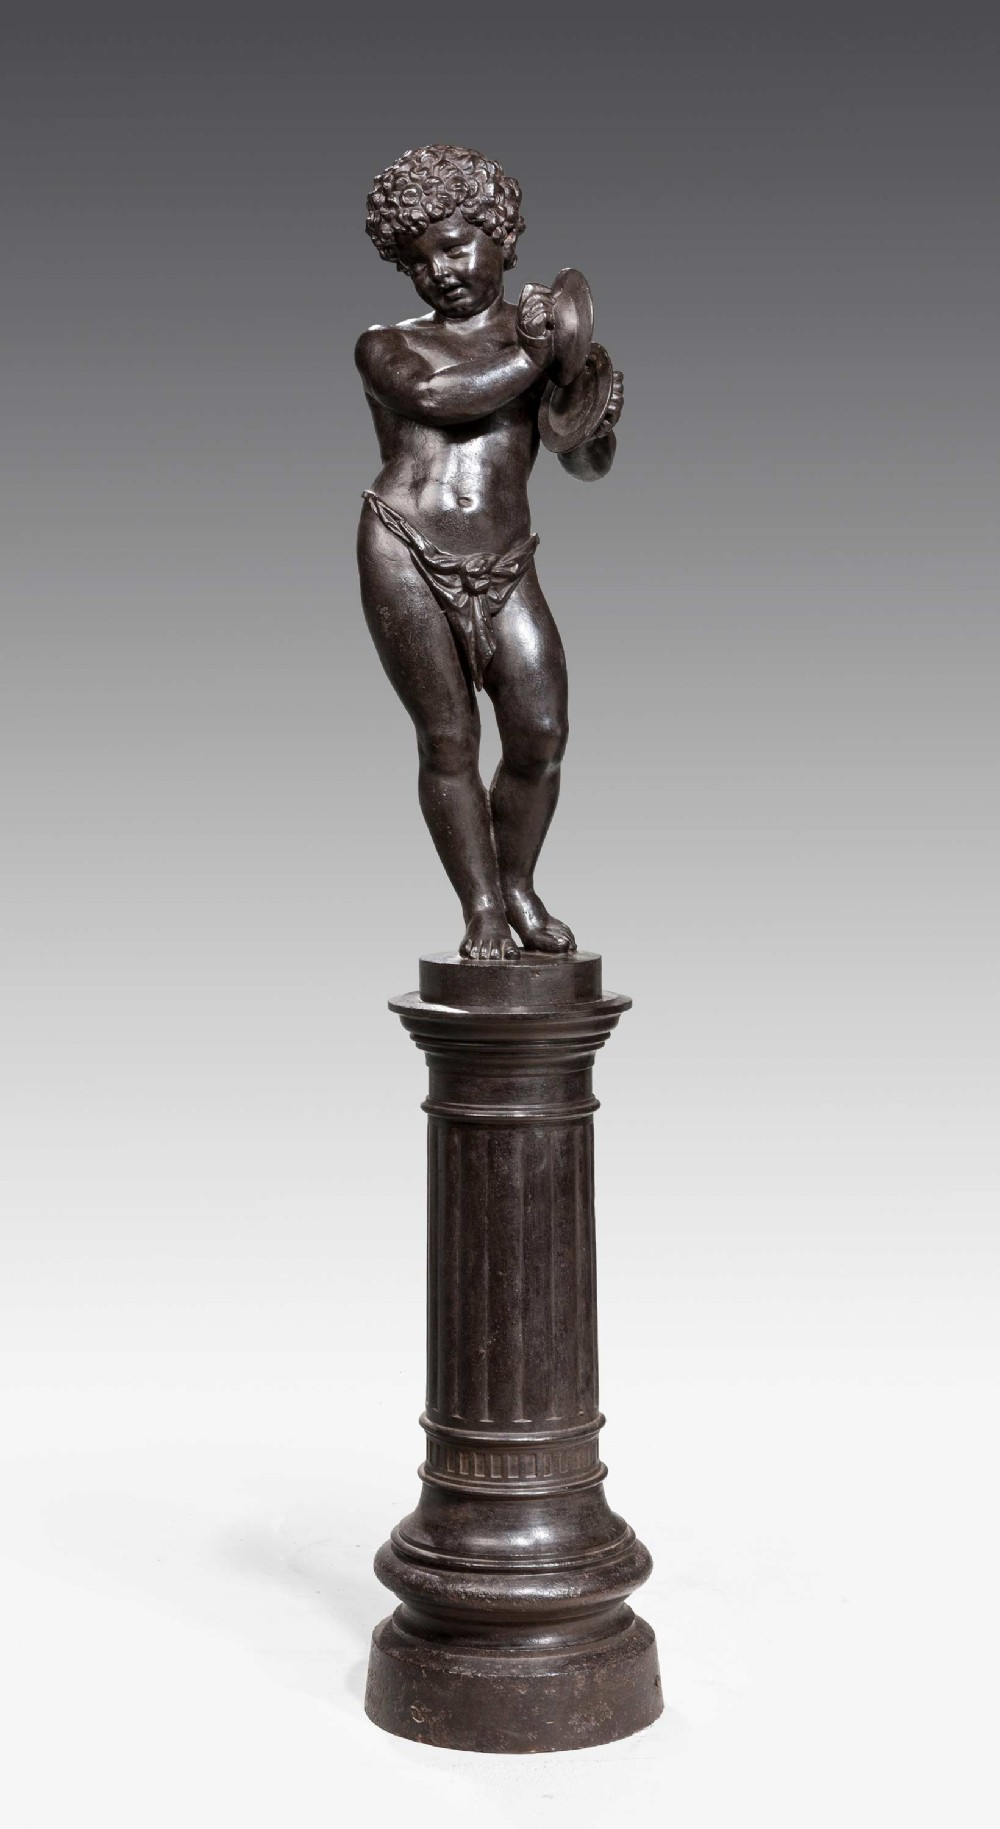 bronze patinated cast iron figure of a putti